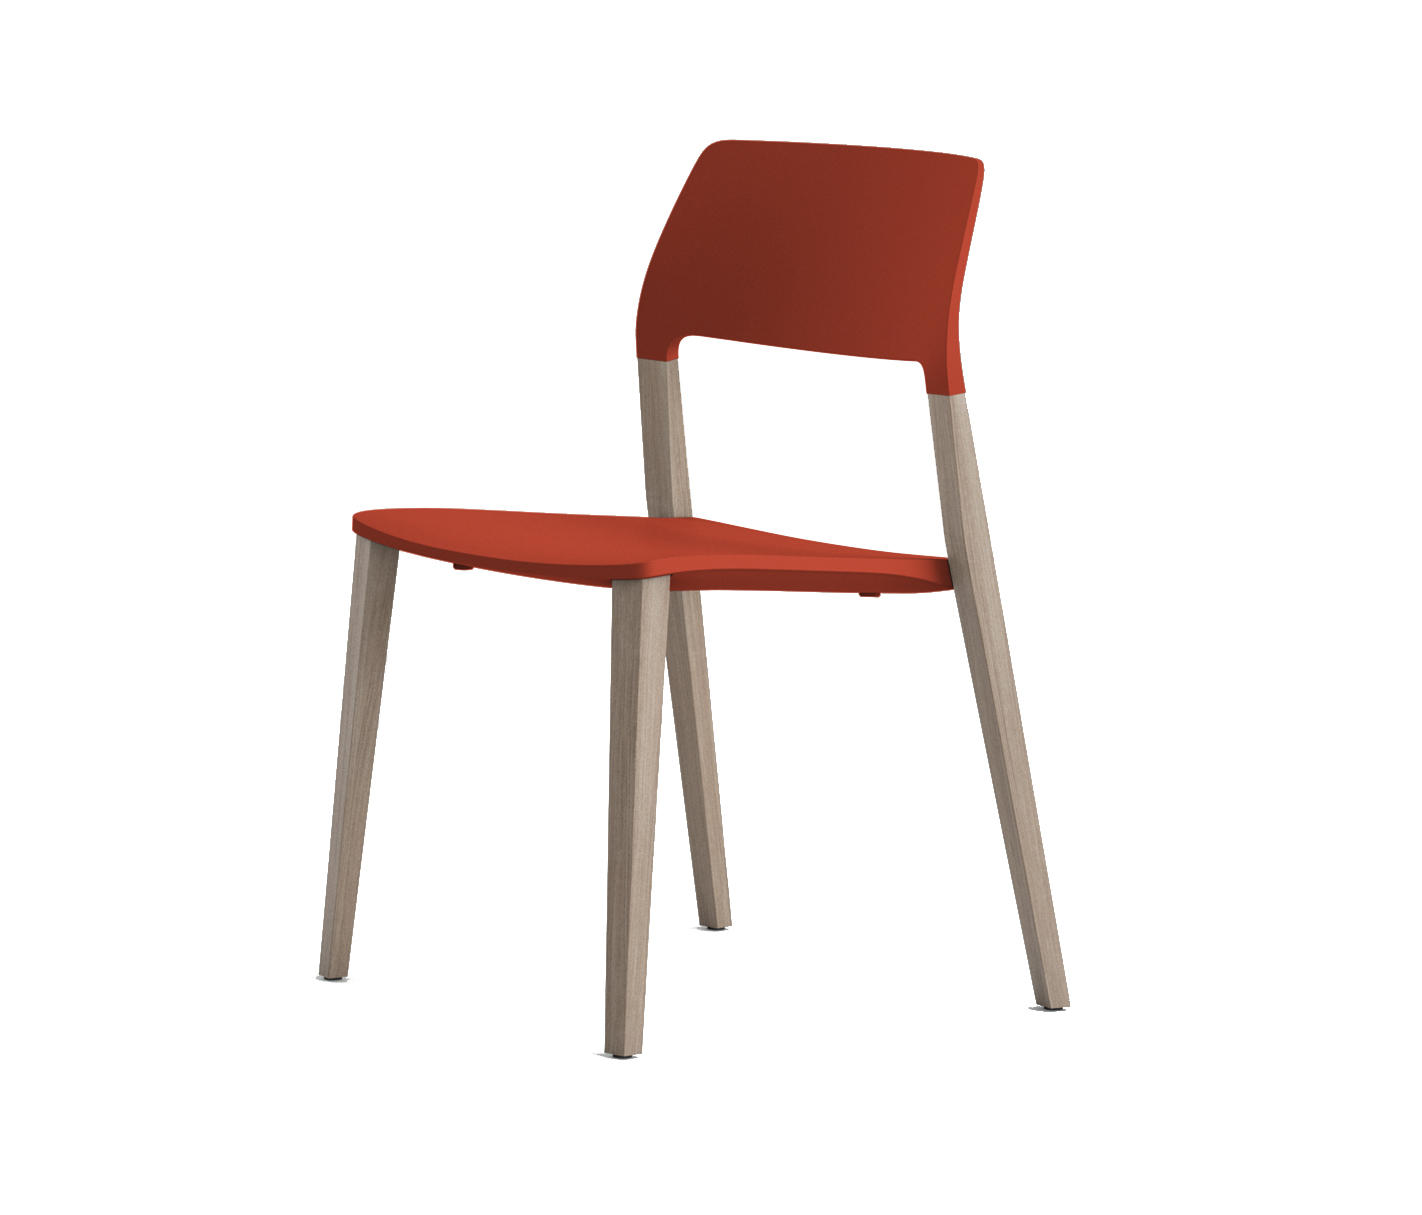 Halm 3852 By Brunner | Restaurant Chairs